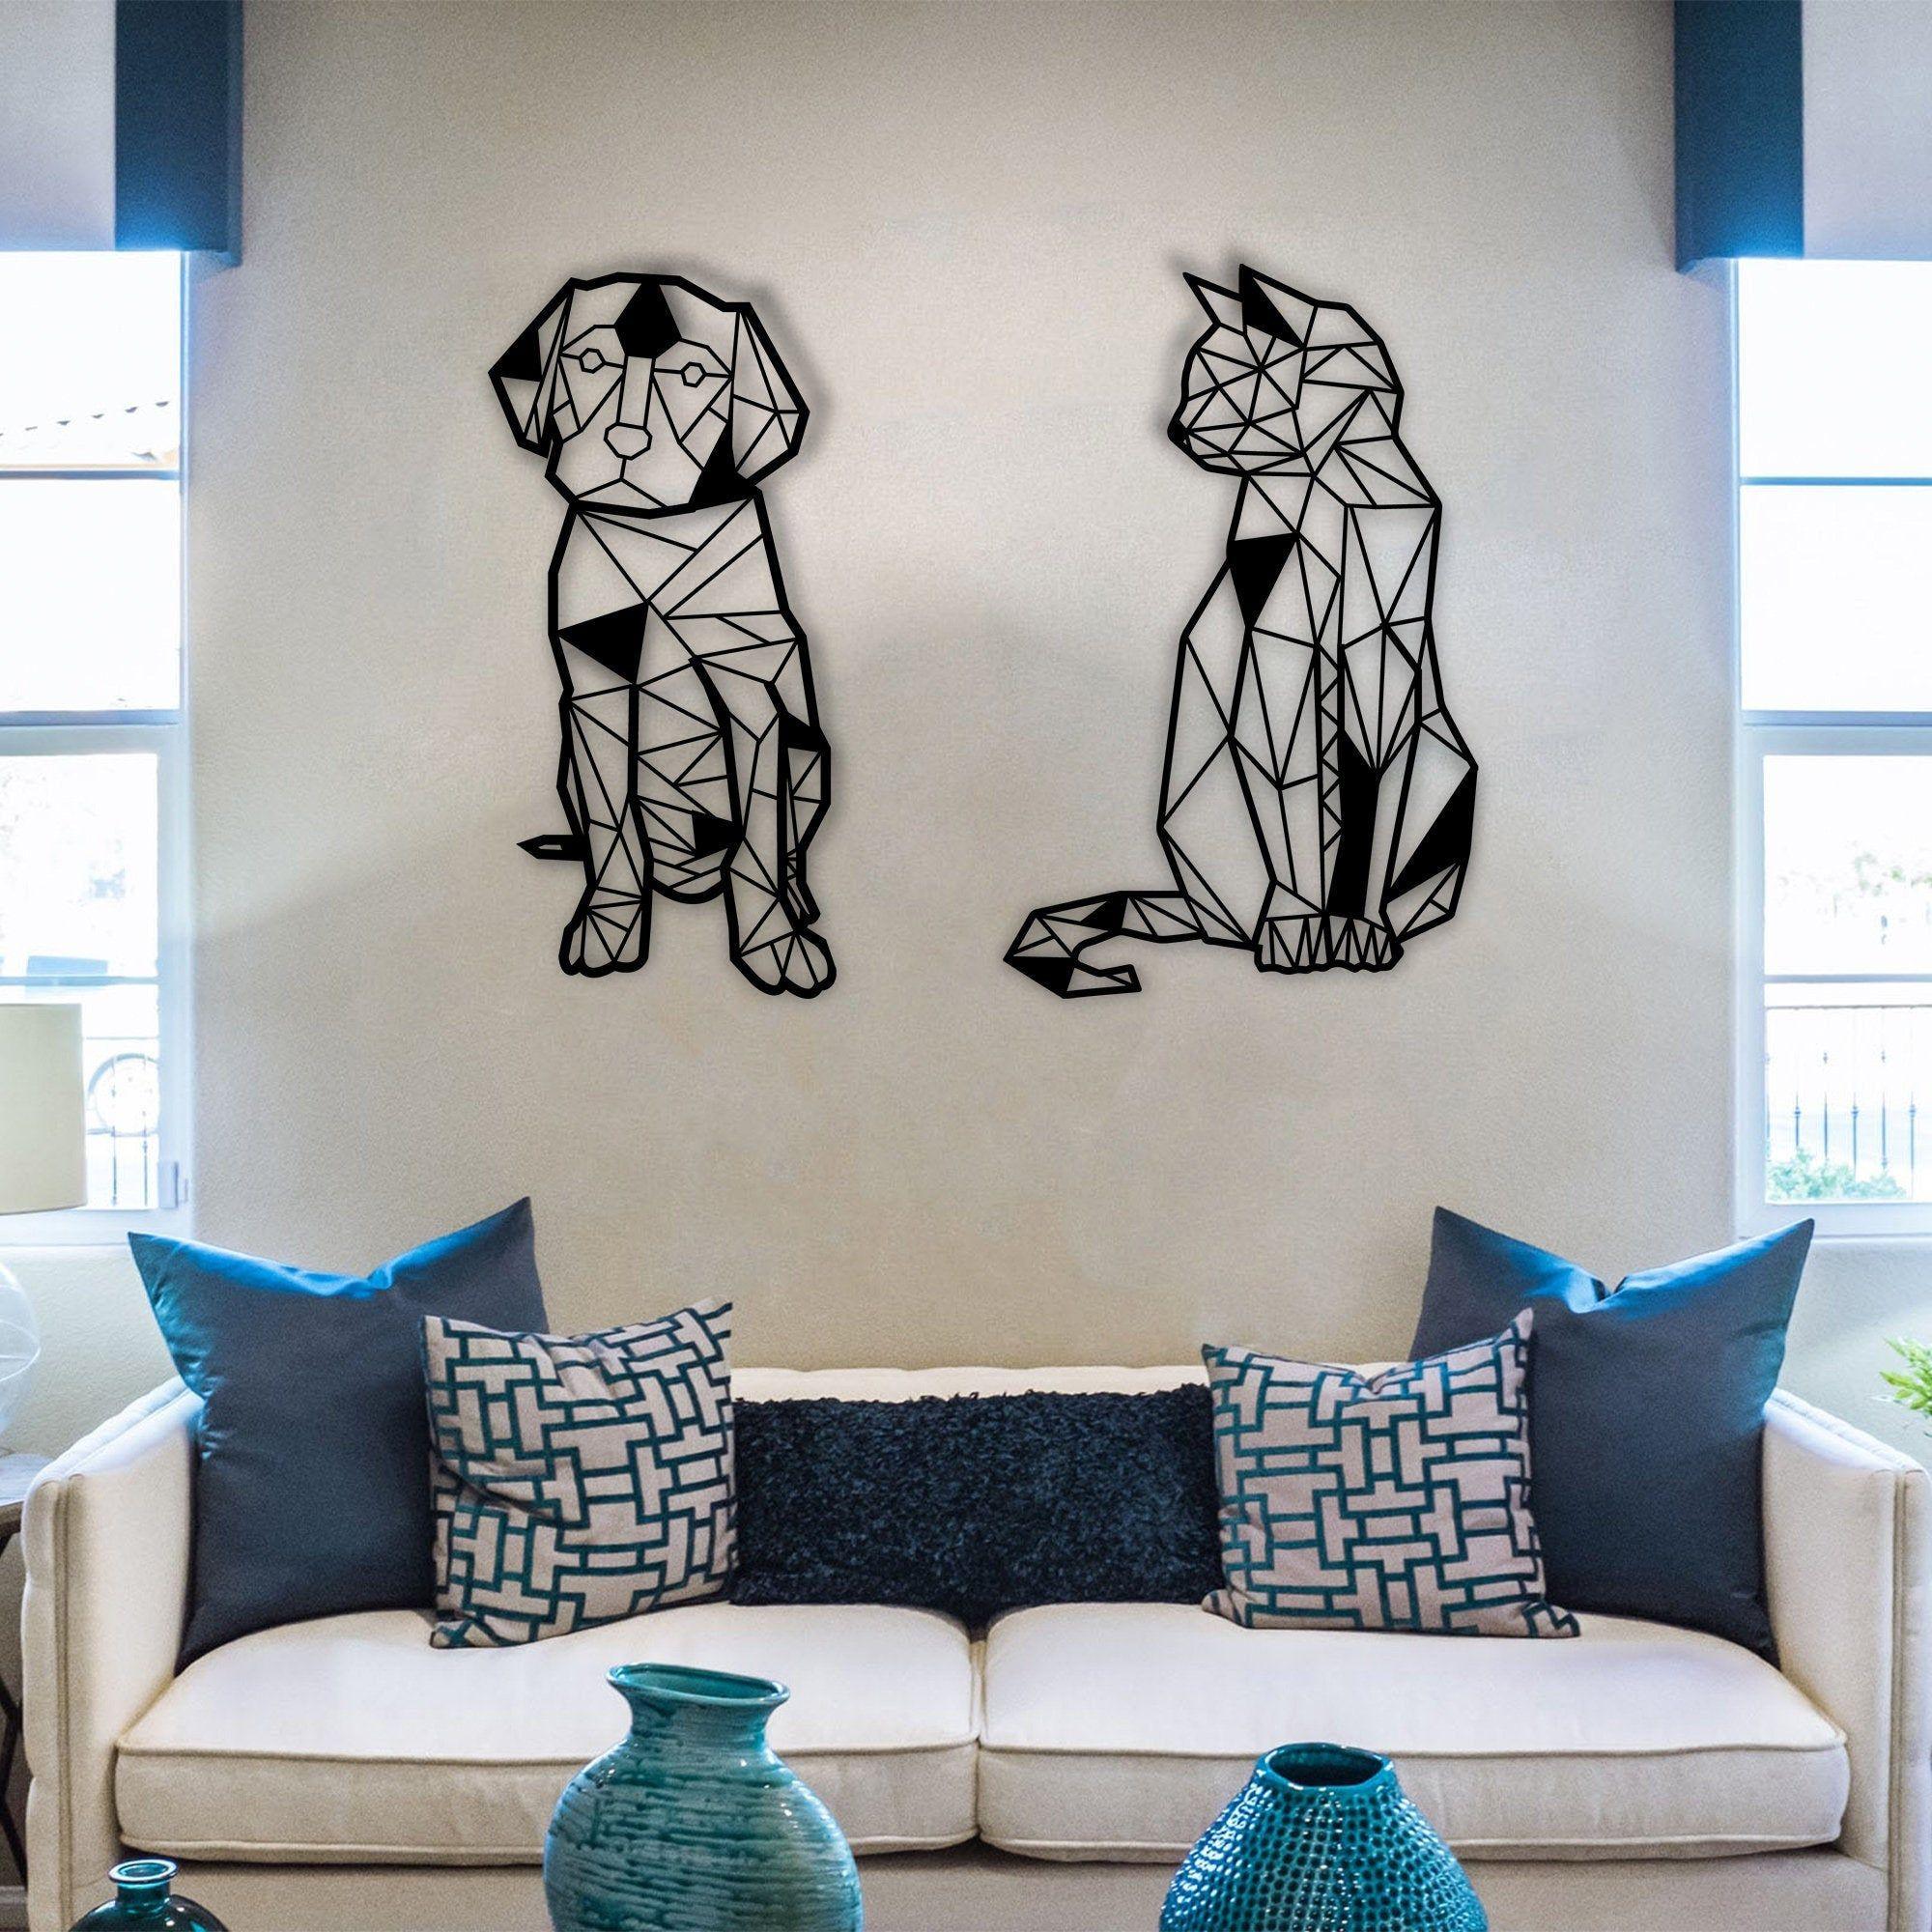 Metal Wall Art Geometric Cat And Dog Inerior Decoration Etsy Cat Wall Art Dog Wall Art Geometric Cat